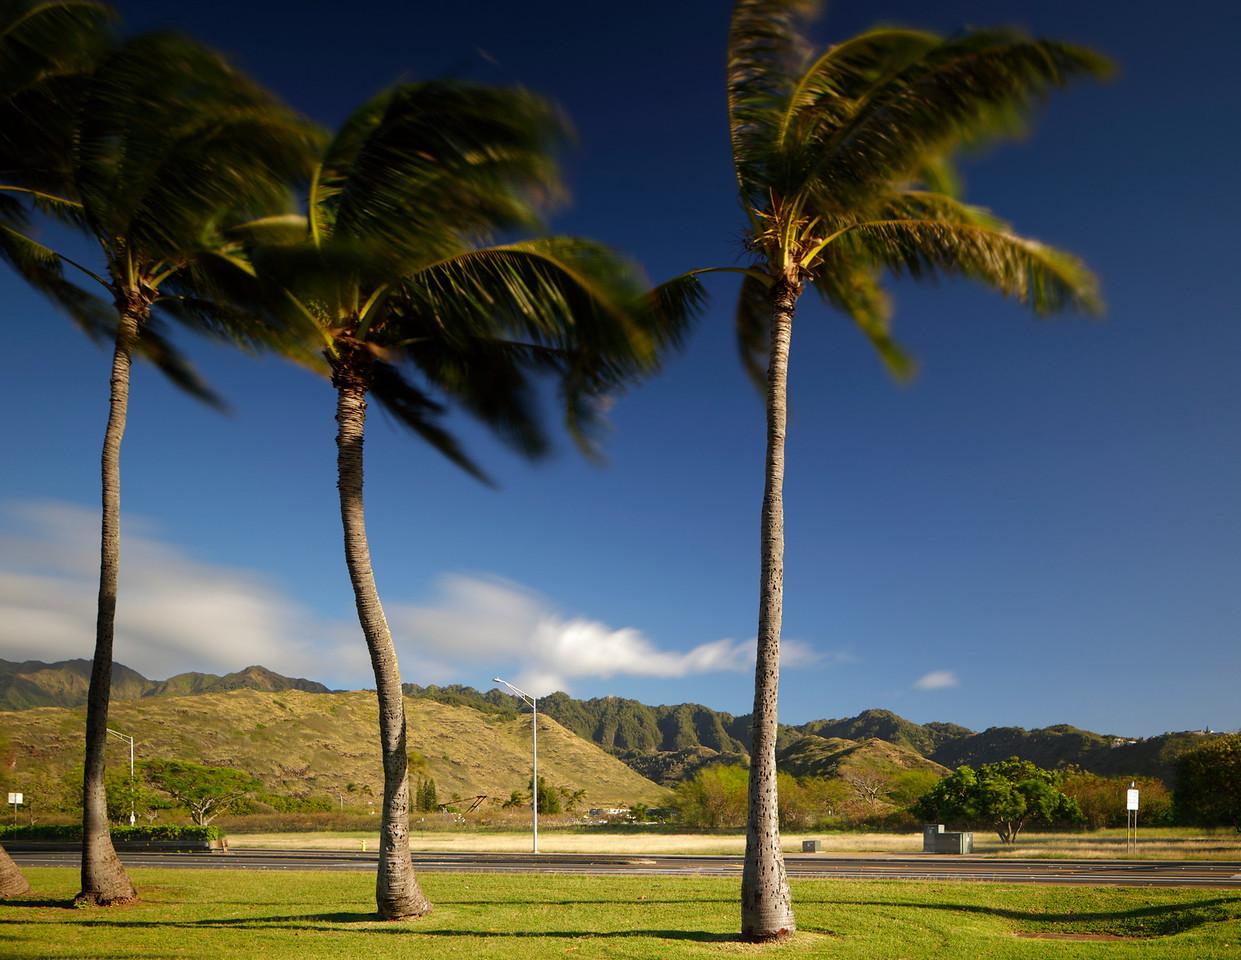 Hawaiian palms in the wind